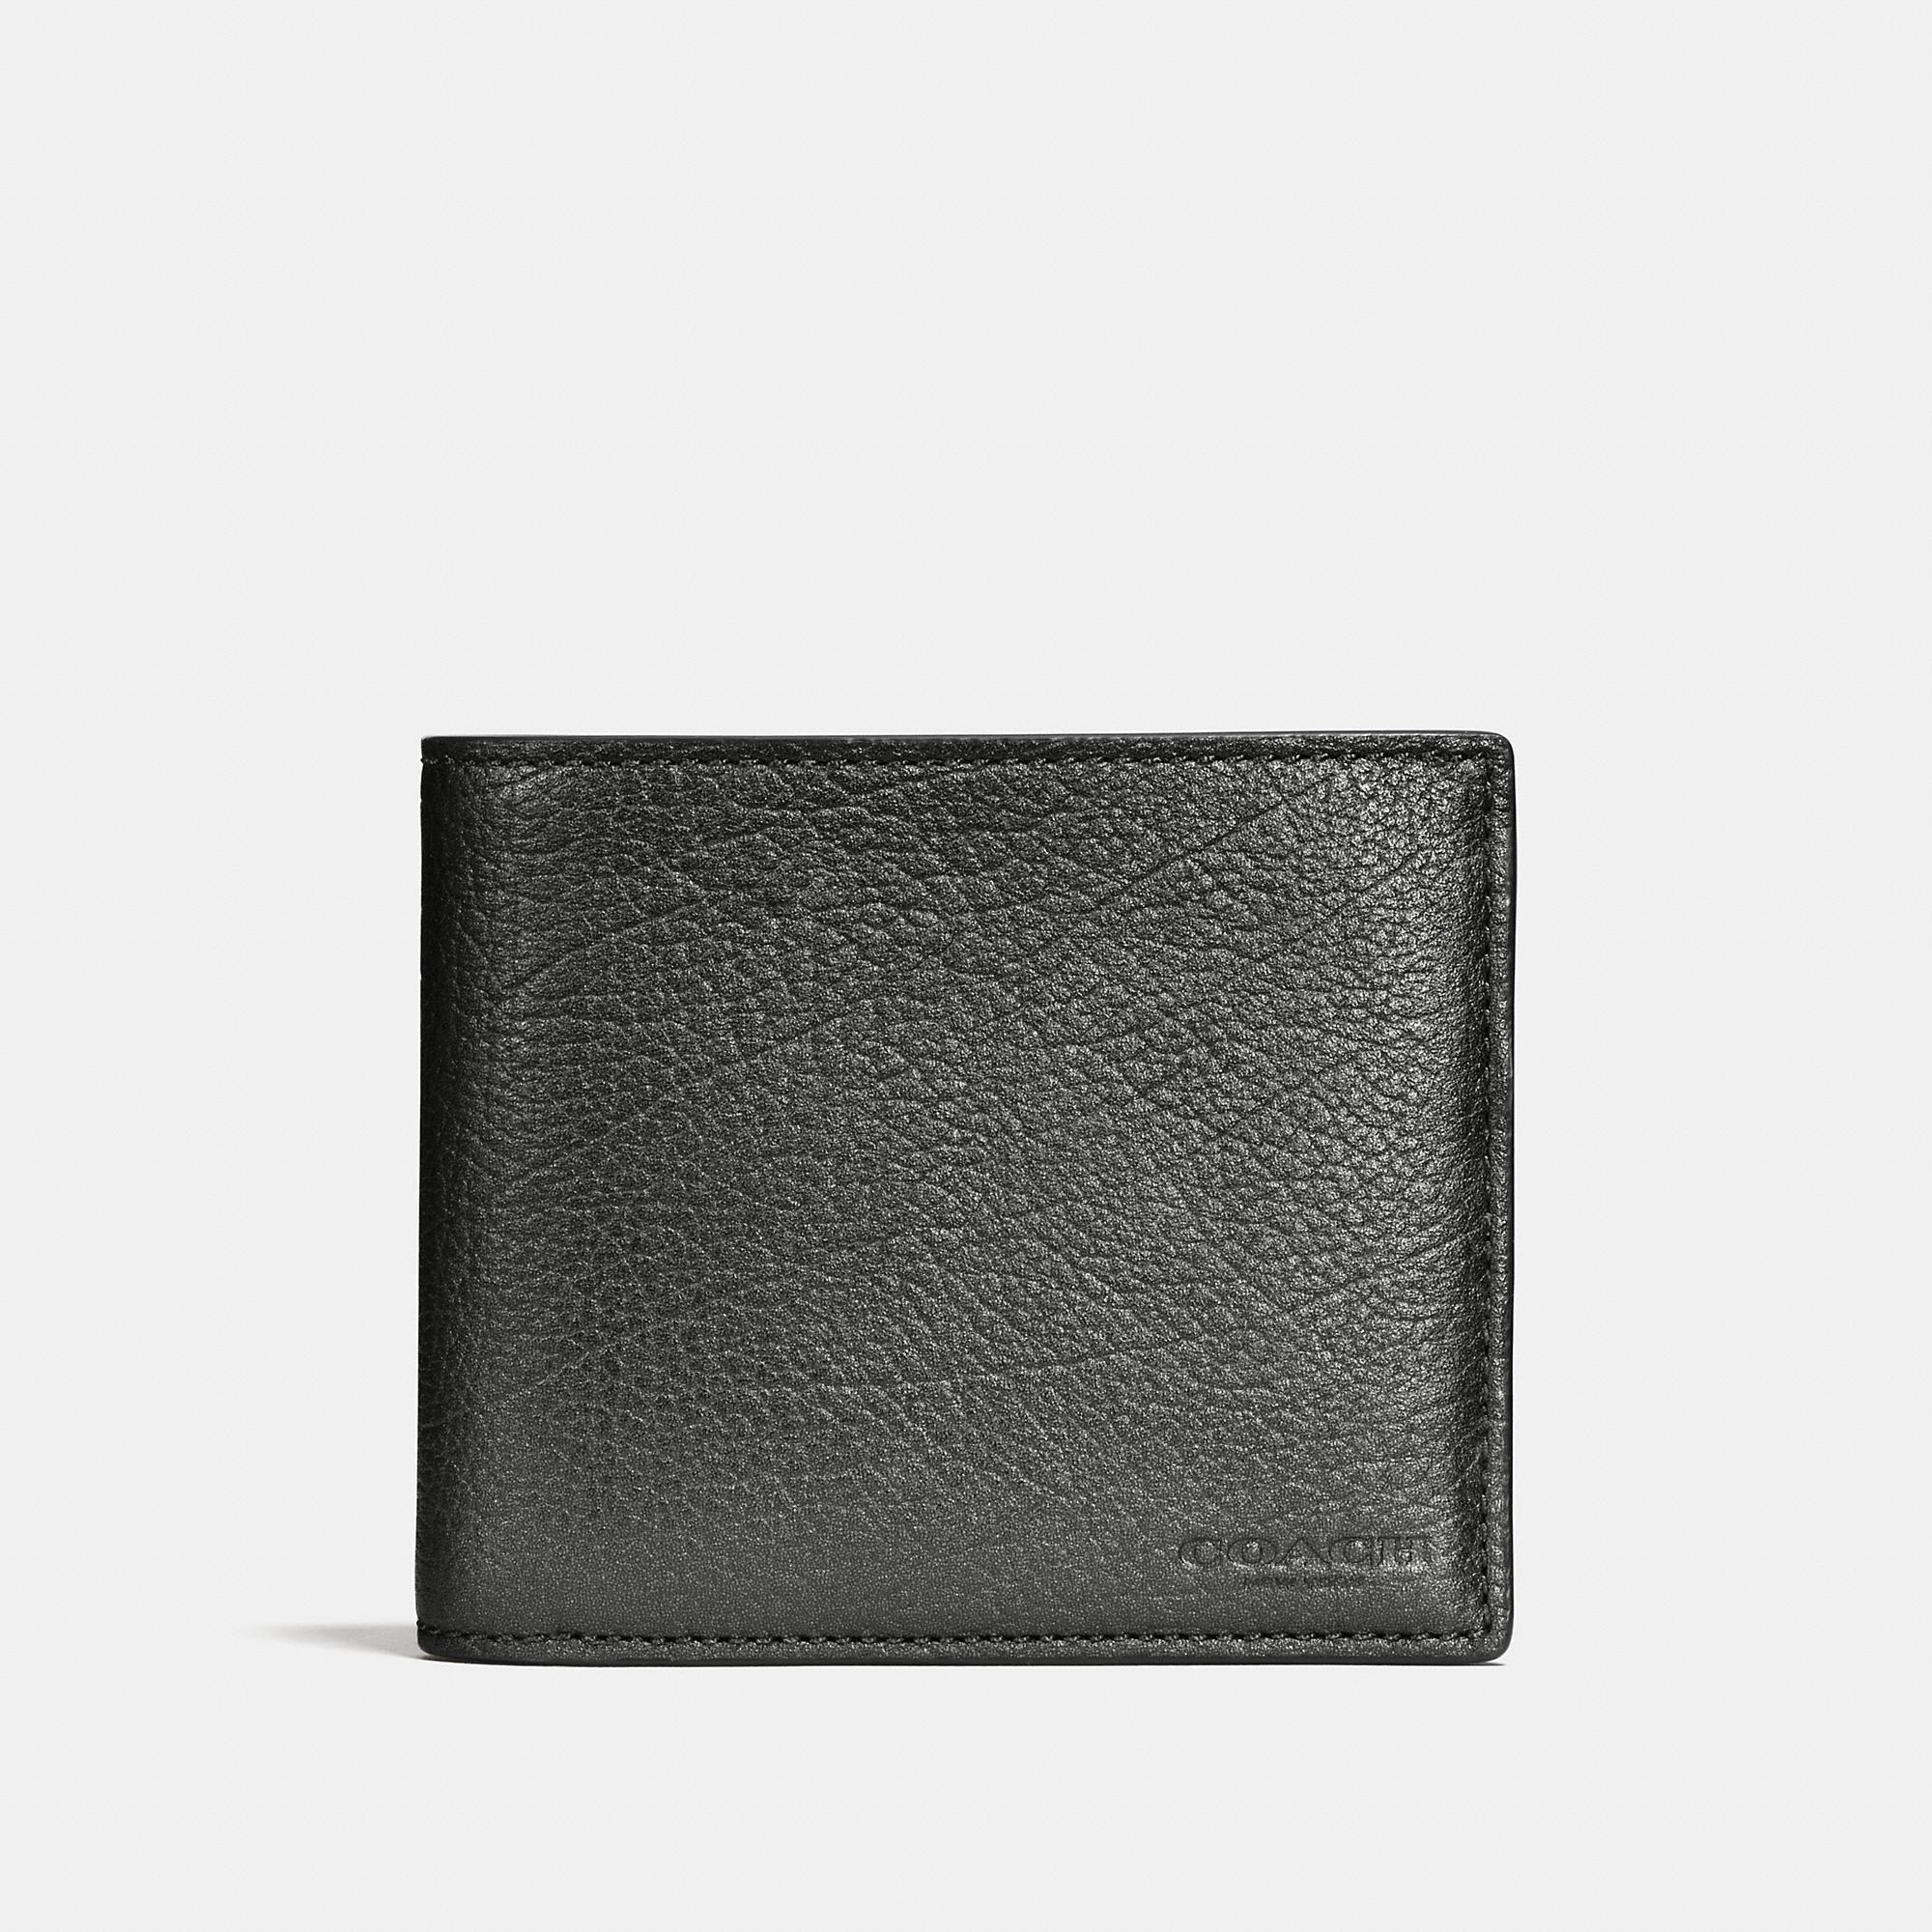 Coach 3-in-1 Wallet In Metallic Leather